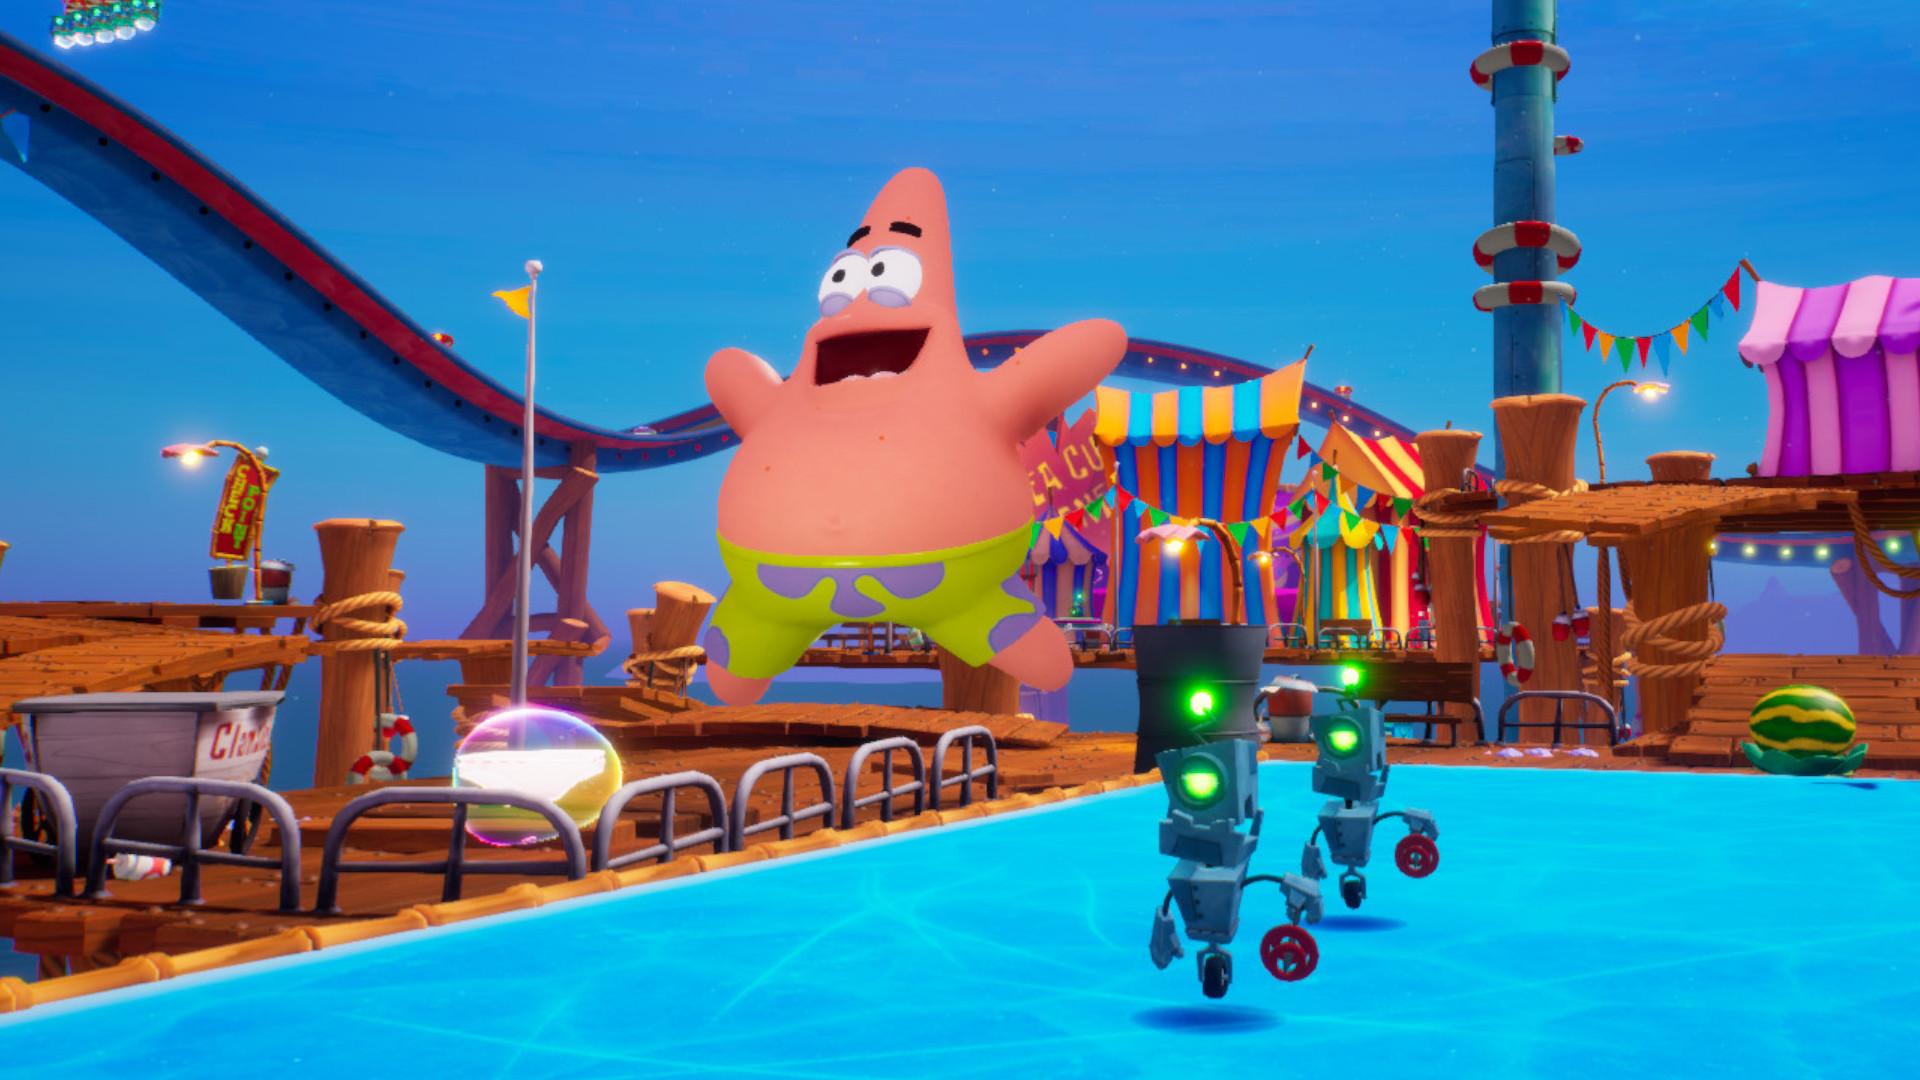 SpongeBob SquarePants: Battle for Bikini Bottom hits Steam in June ...